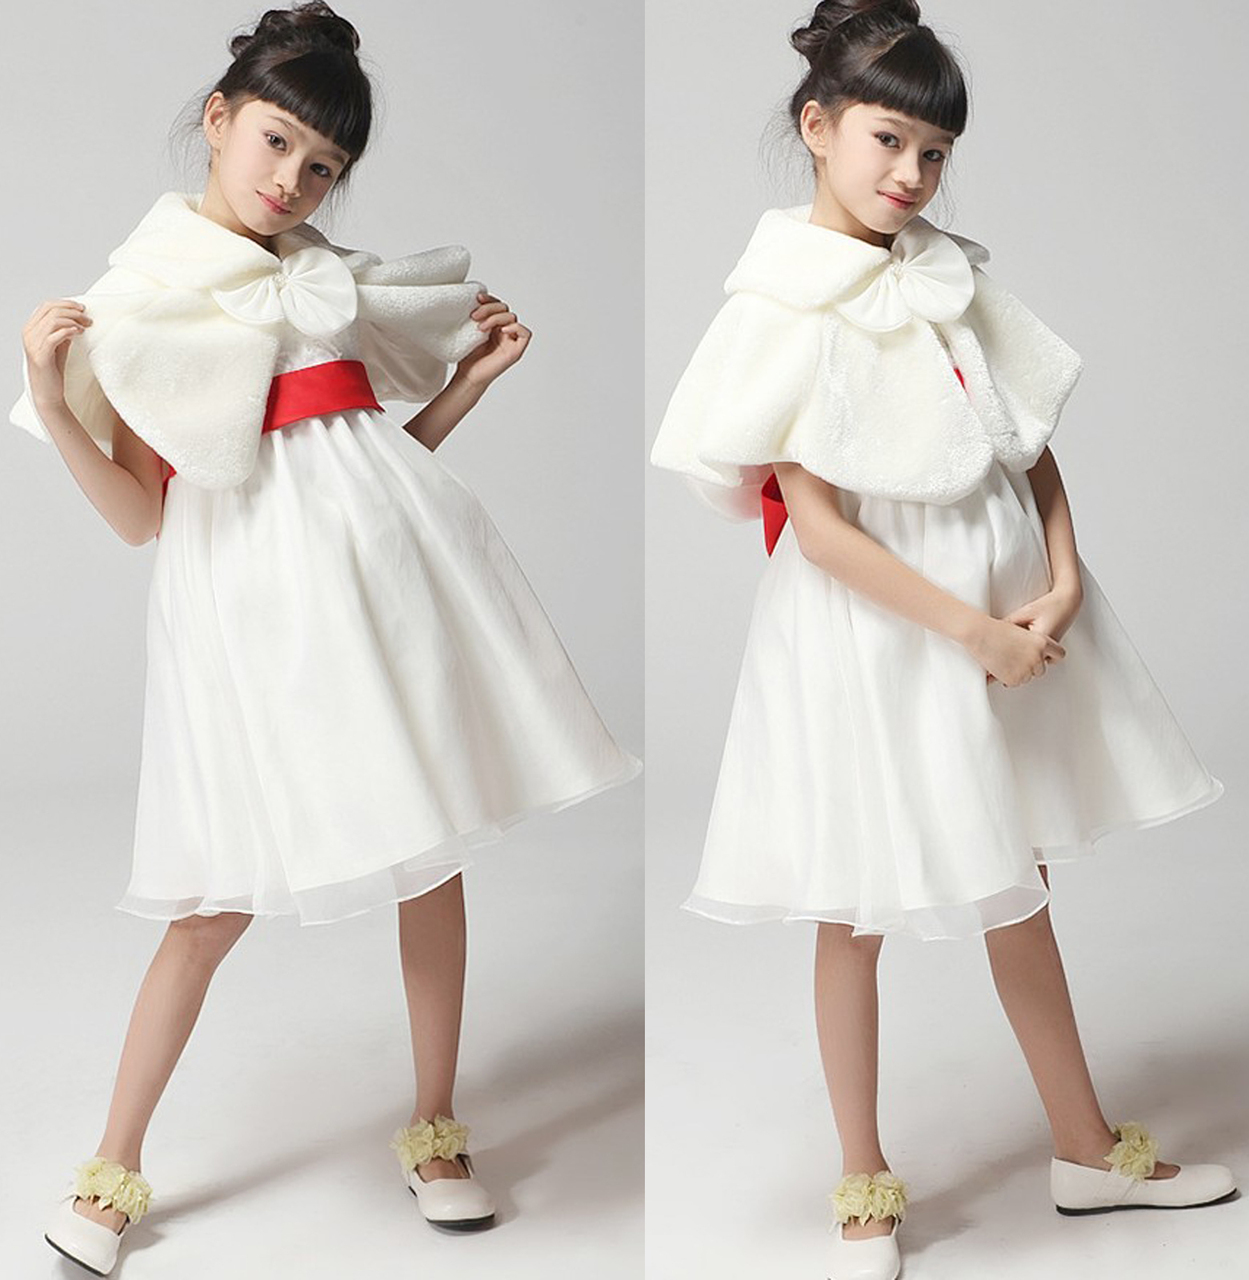 0c402eb3dbf Ivory Wedding Party Flower Girl faux fur stole Wraps Cap S   M   L - Angel  Fashion ltd